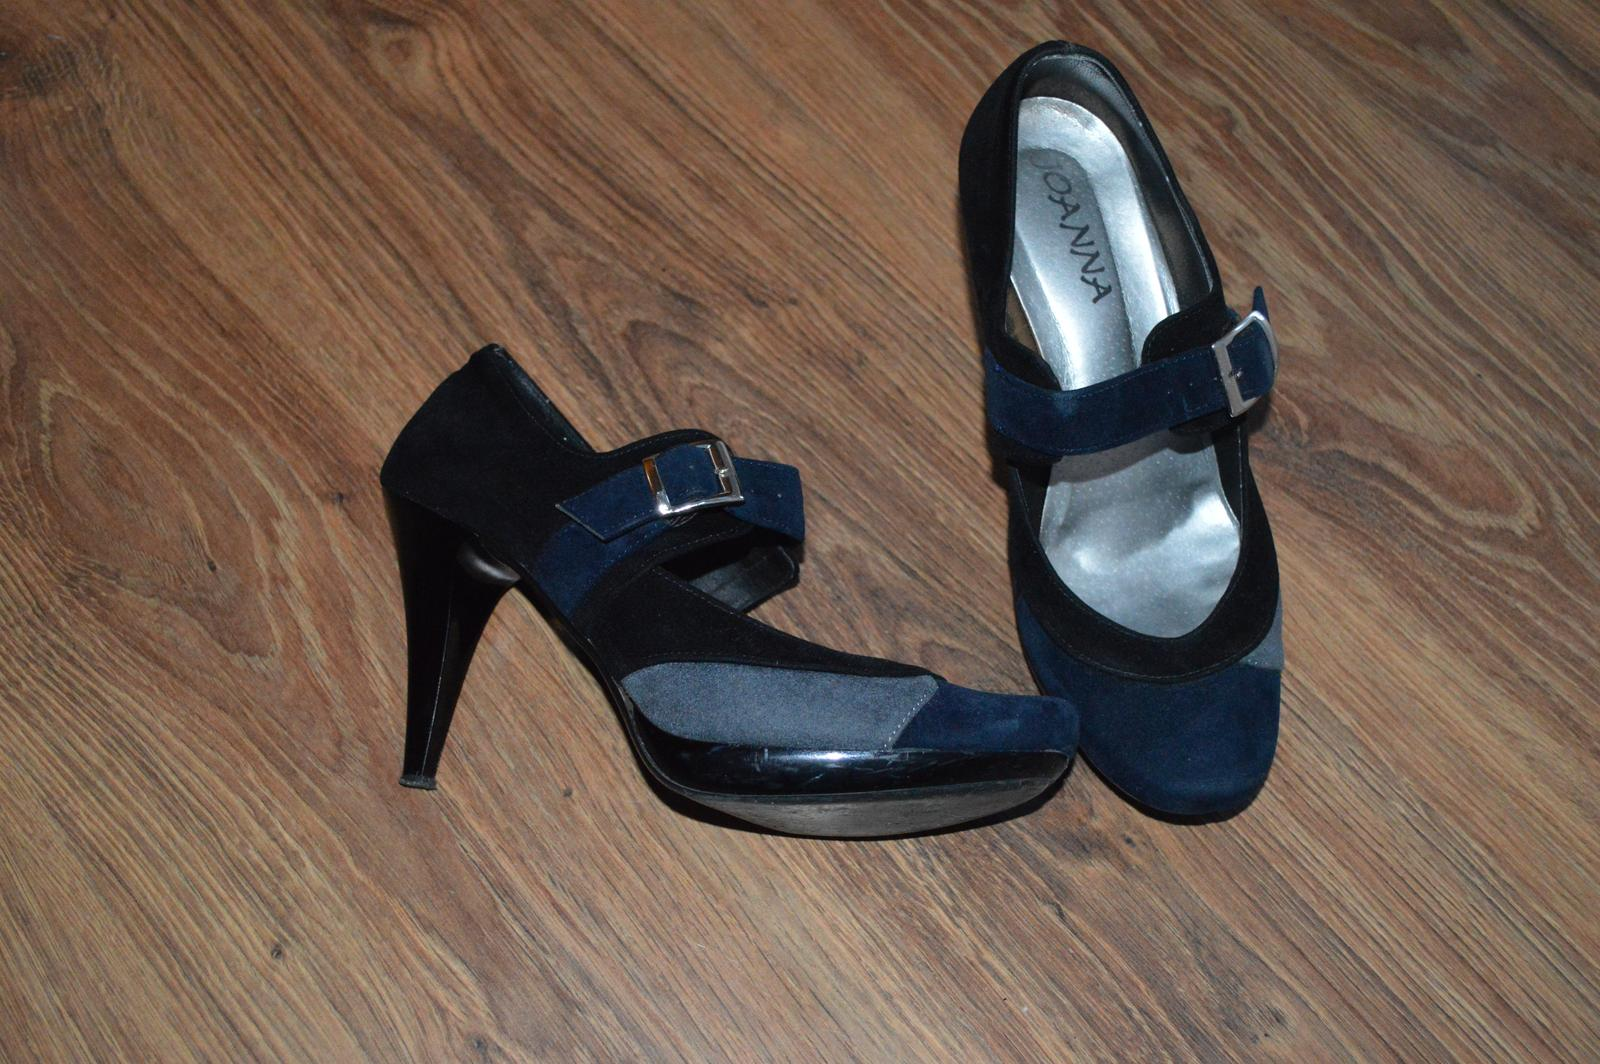 b33de57d3f Dámske lodičky topánky